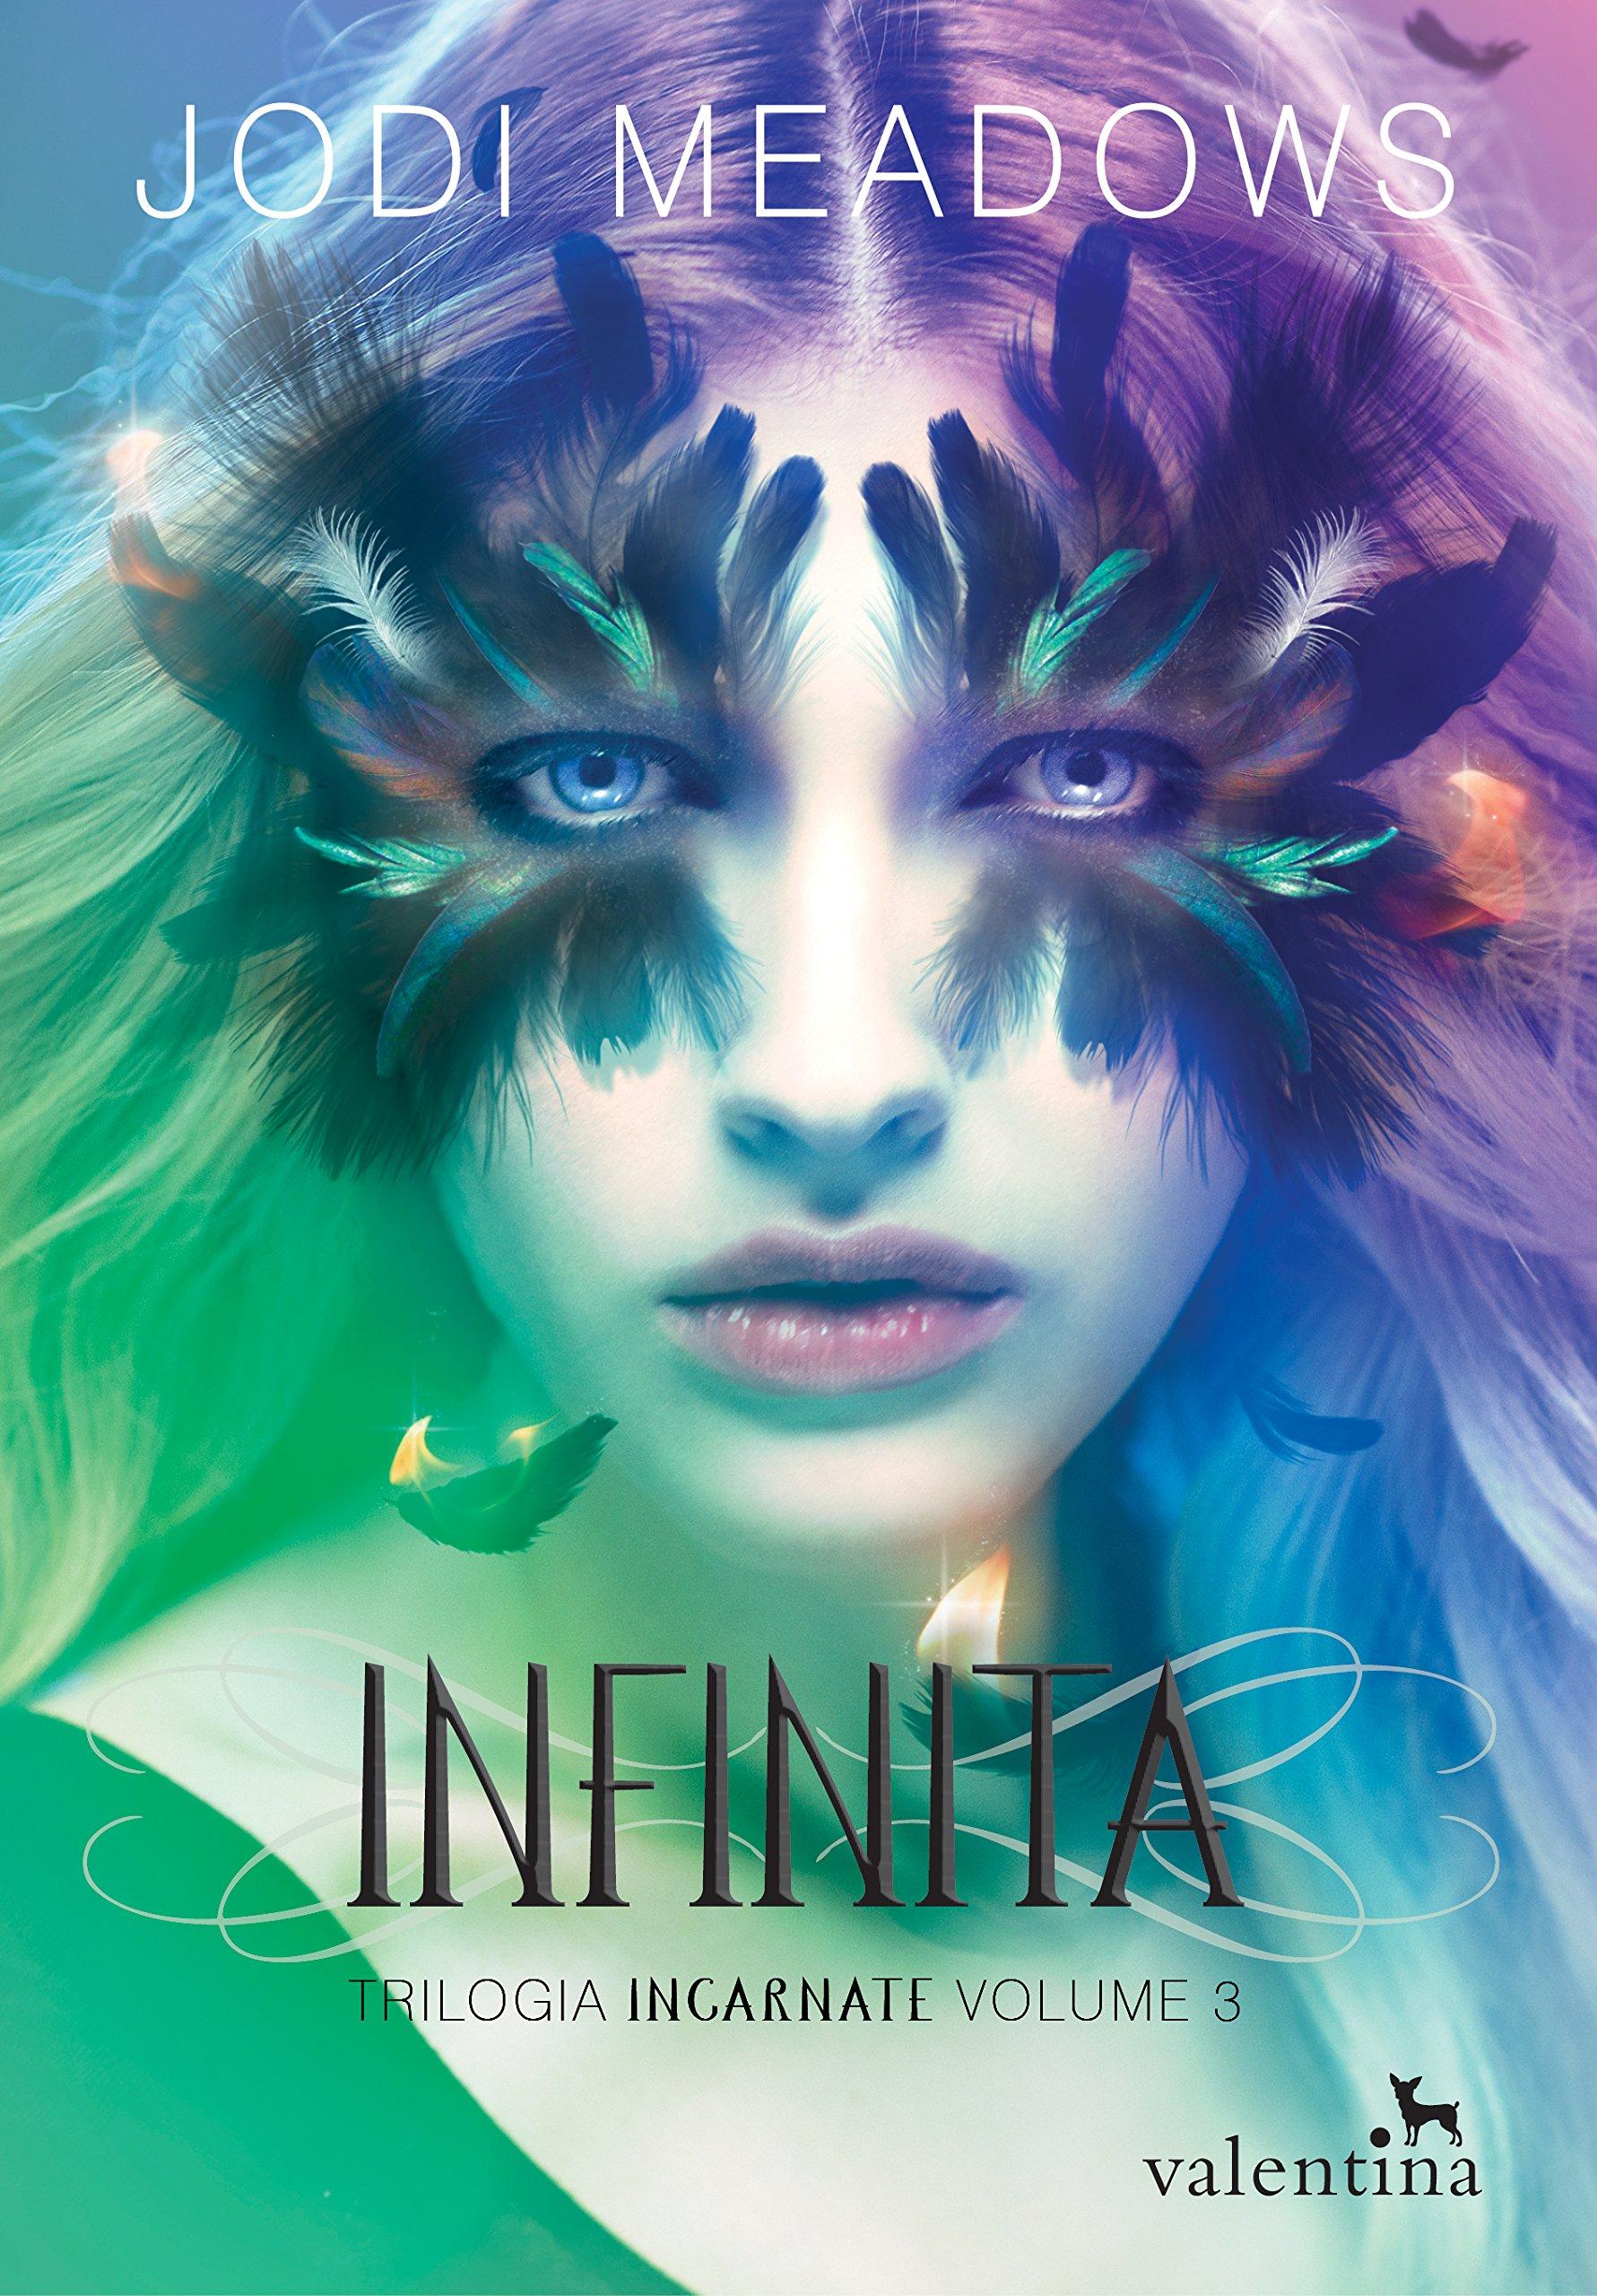 Resenha - Infinita